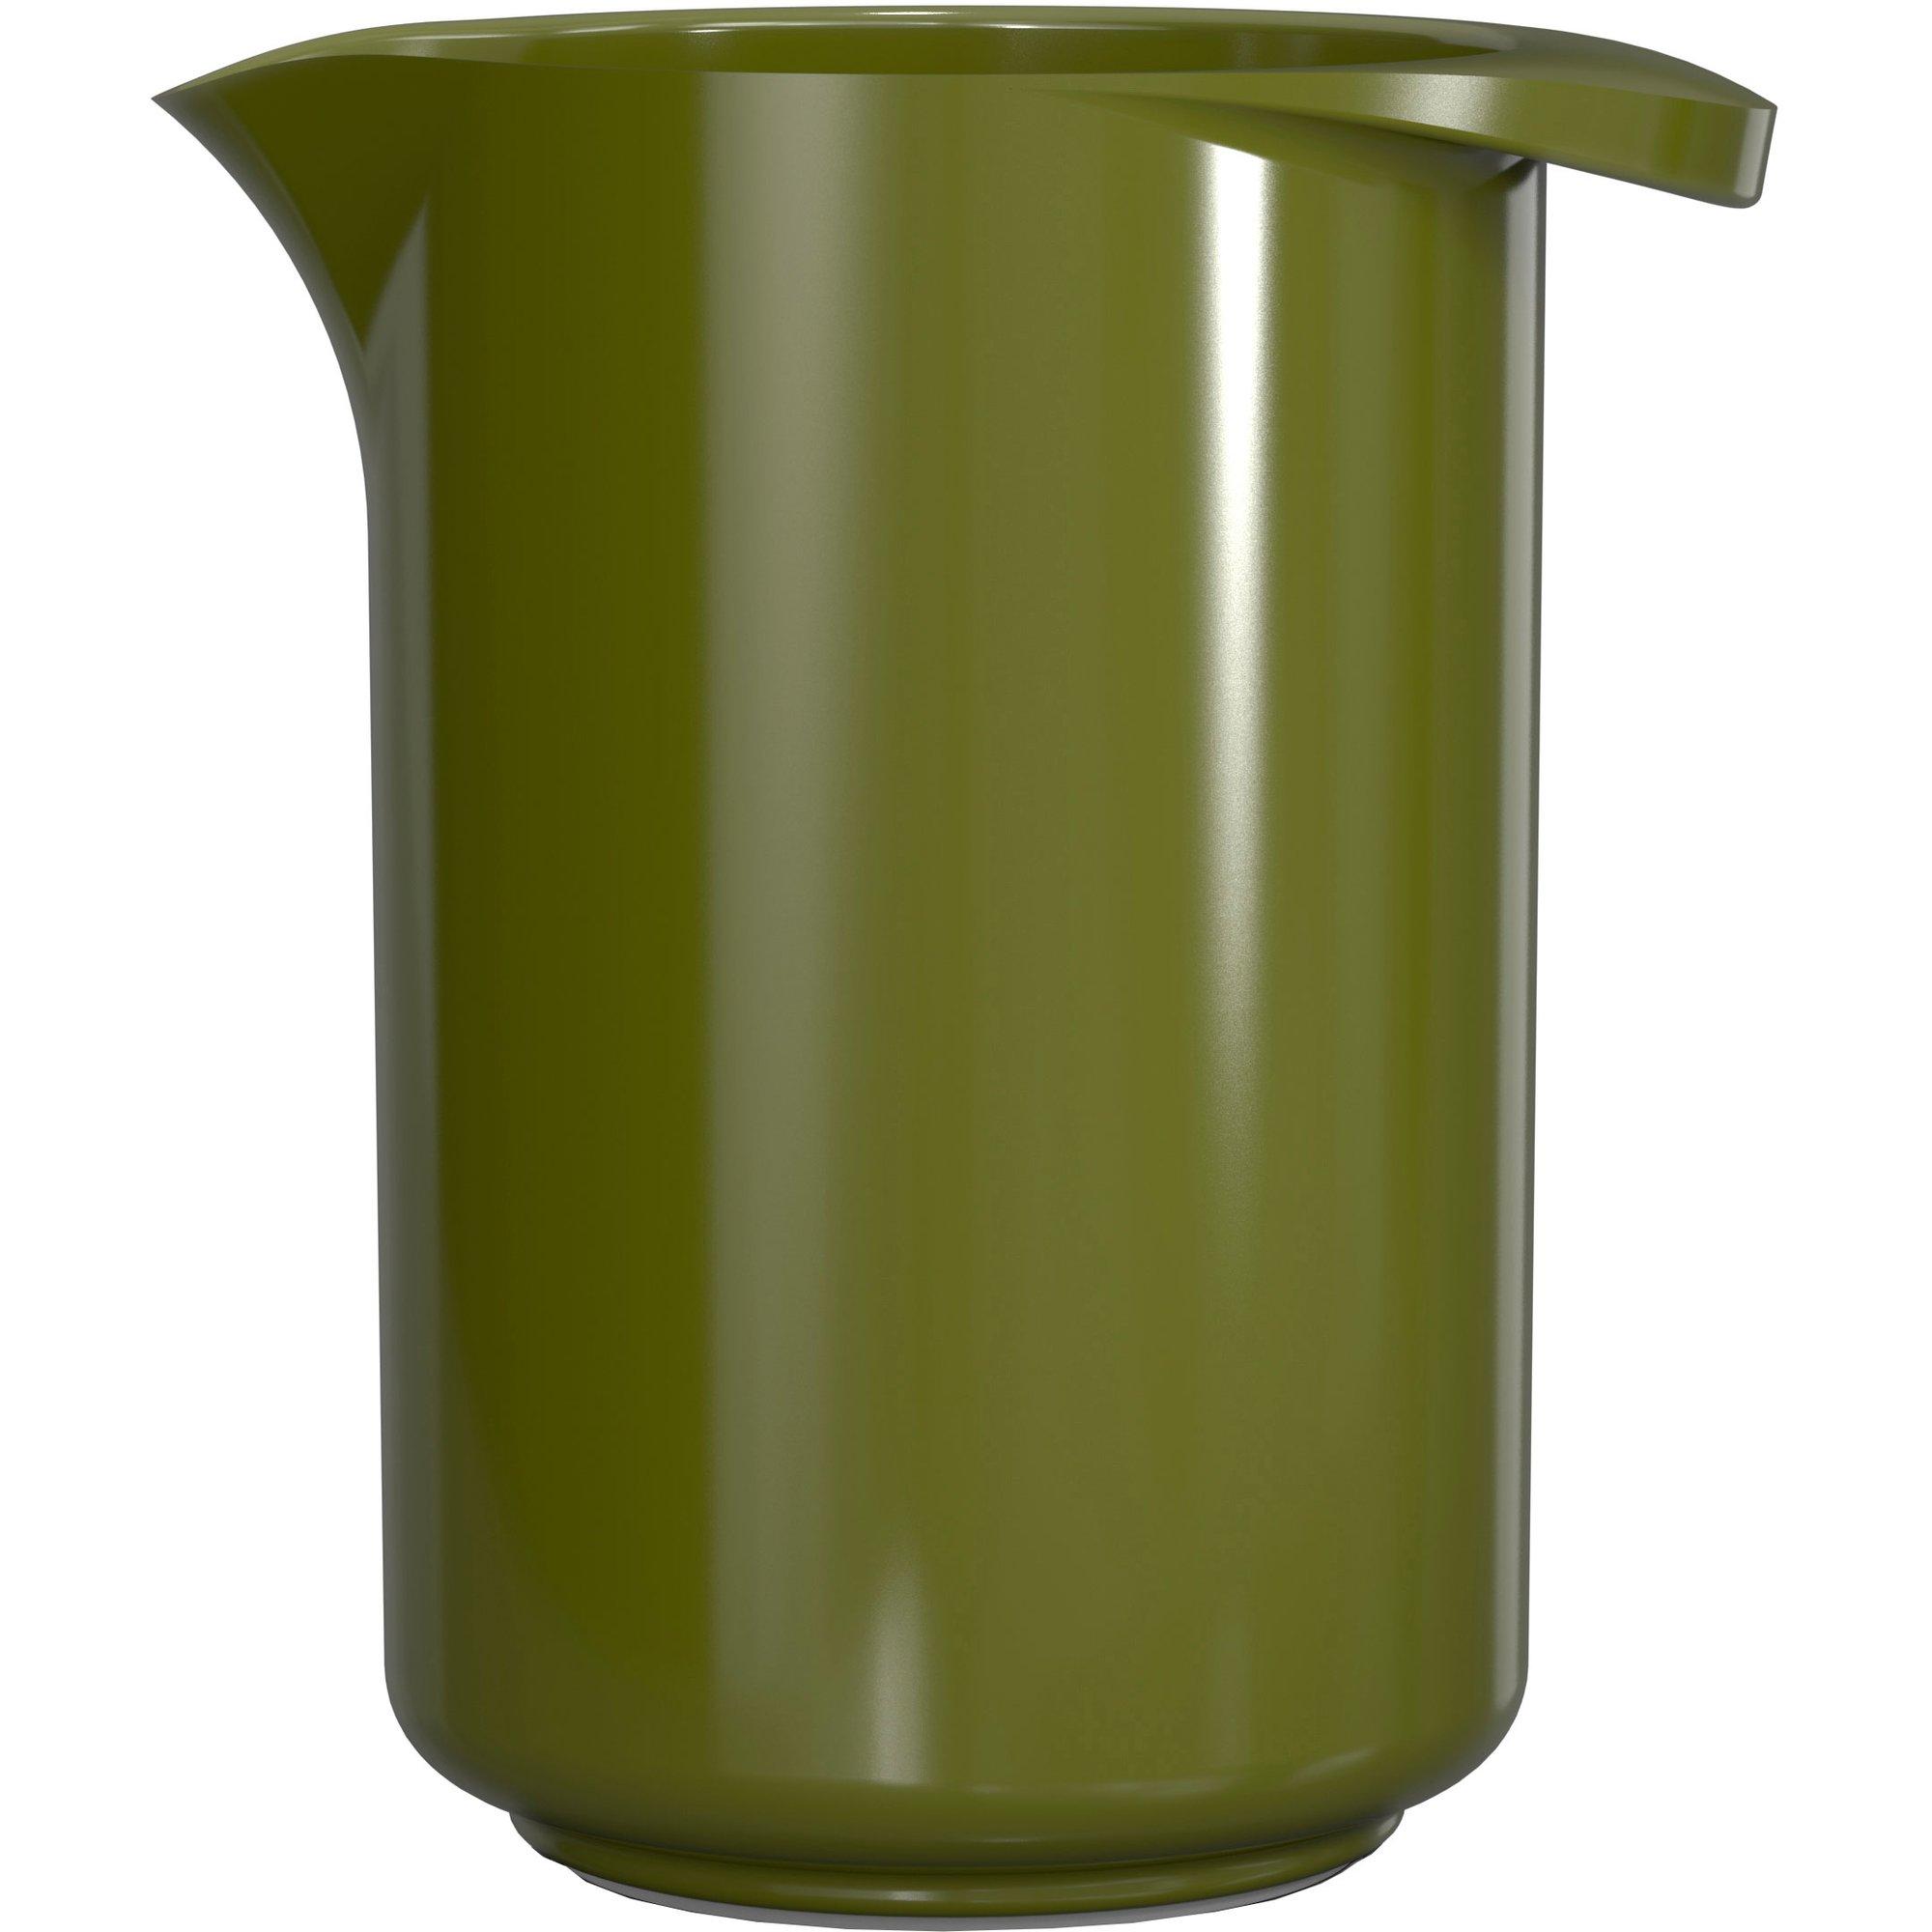 Rosti Mepal Mixkanna 05 liter Olivgrön